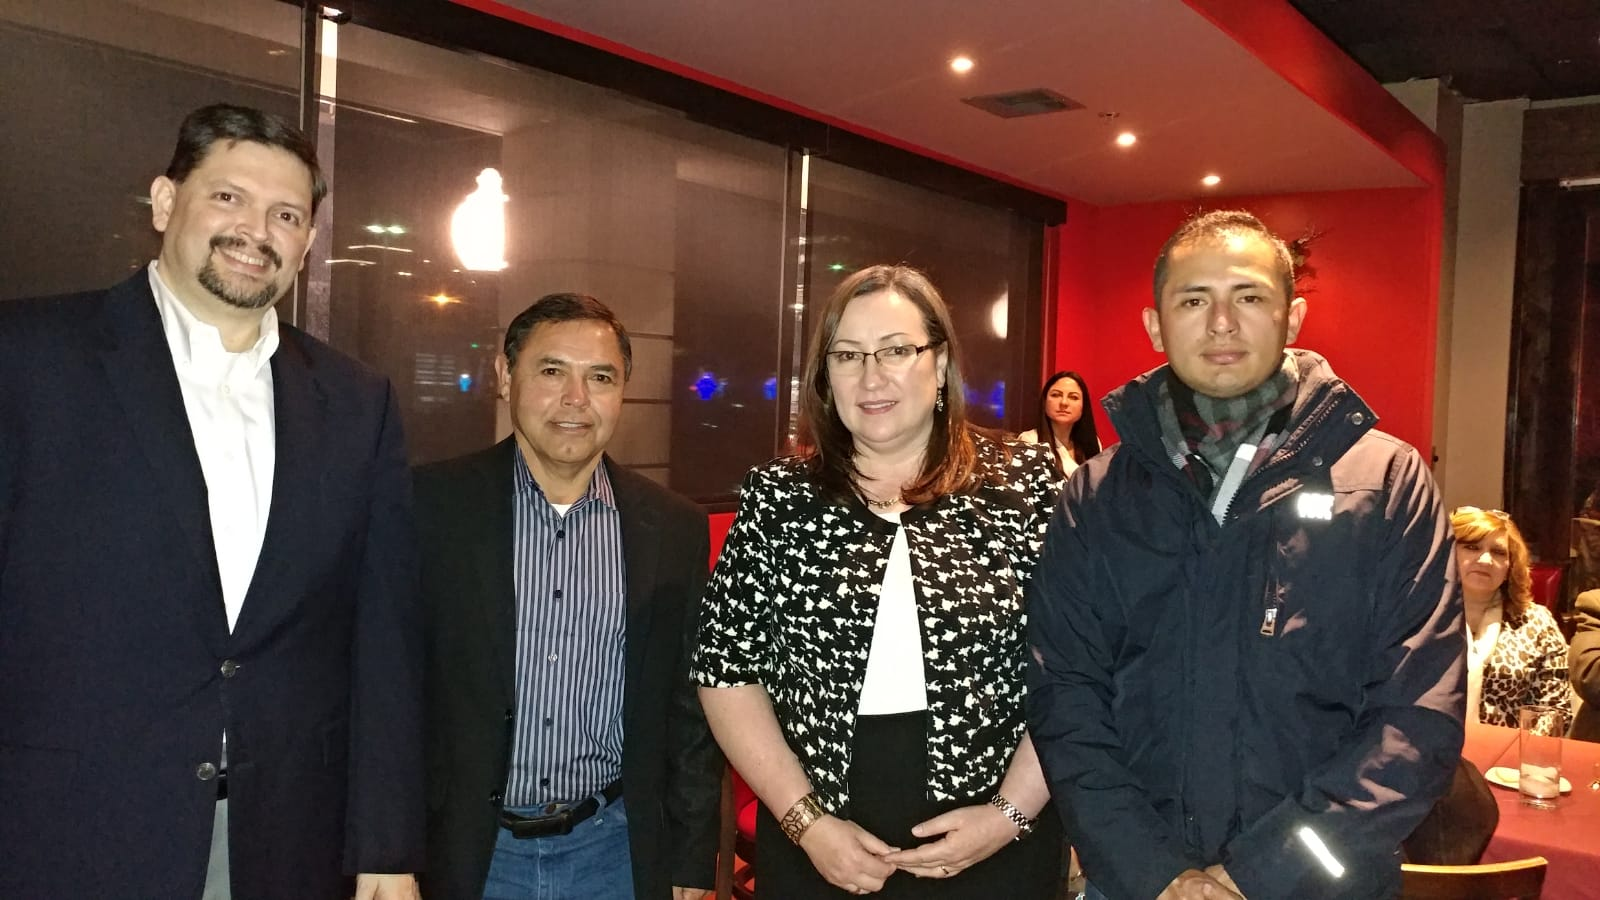 HGSCA, CG, and Jose Aizaga Quito FD